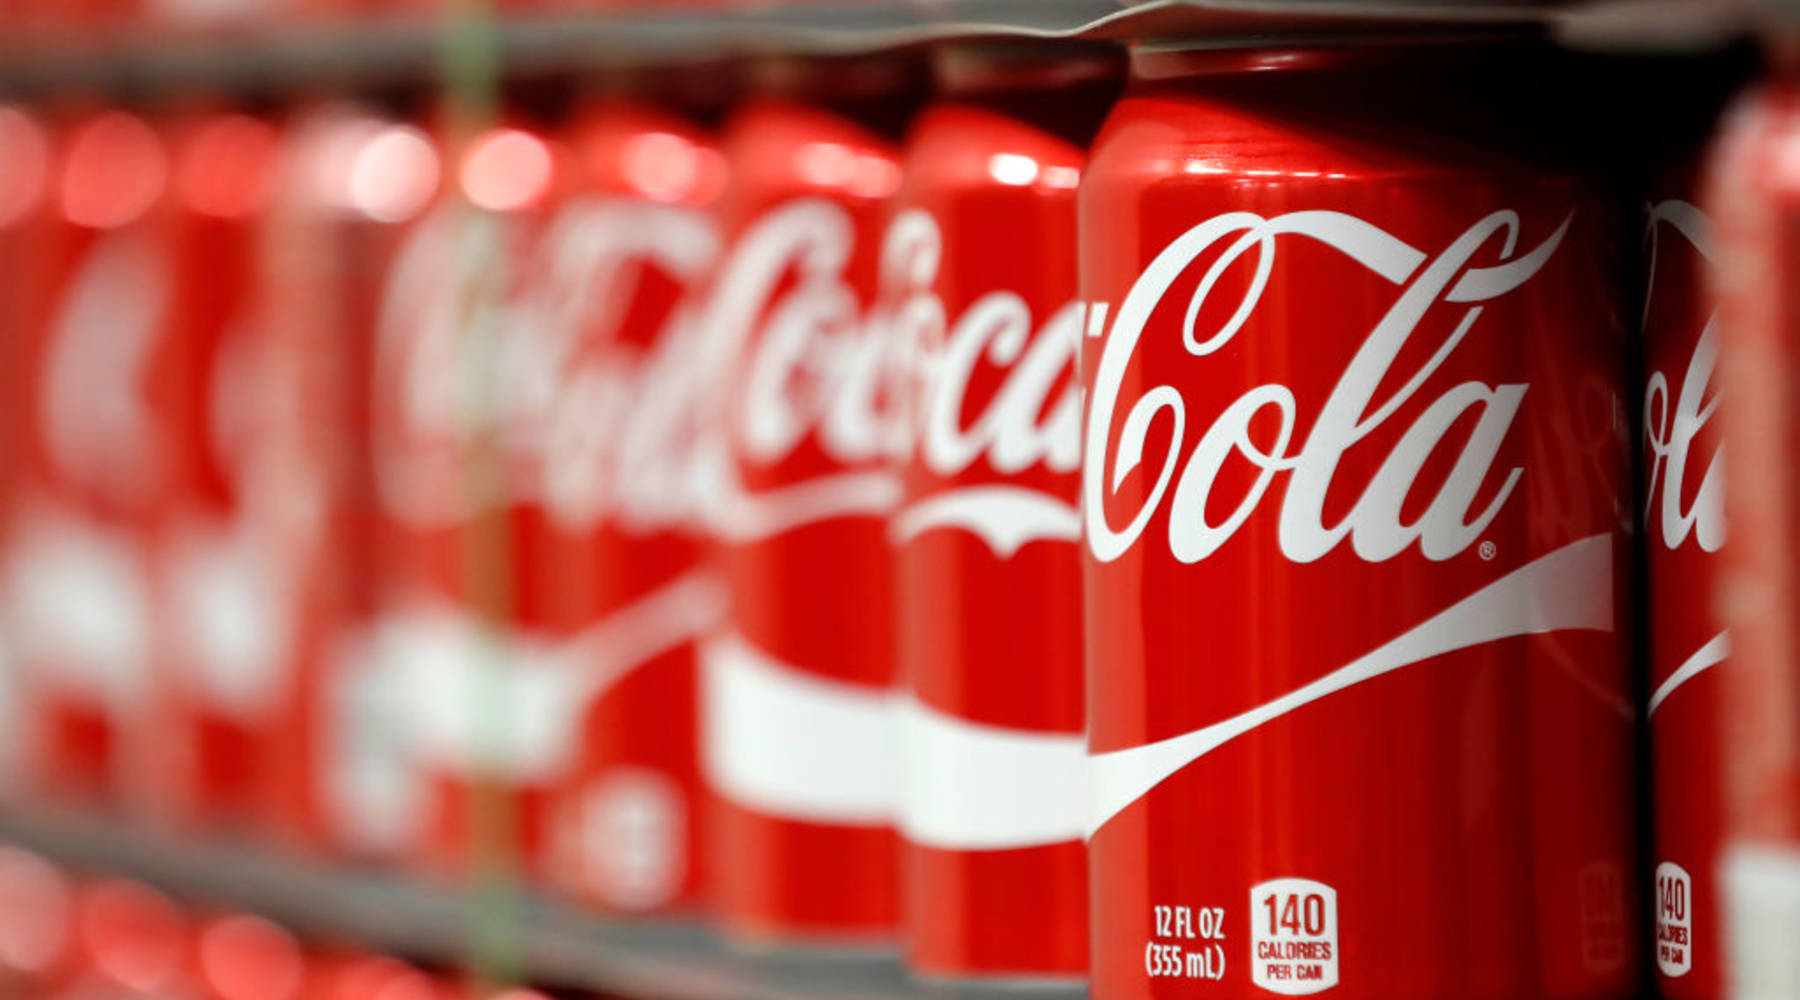 Pepsi comes to Coke's hometown of Atlanta for the Super Bowl